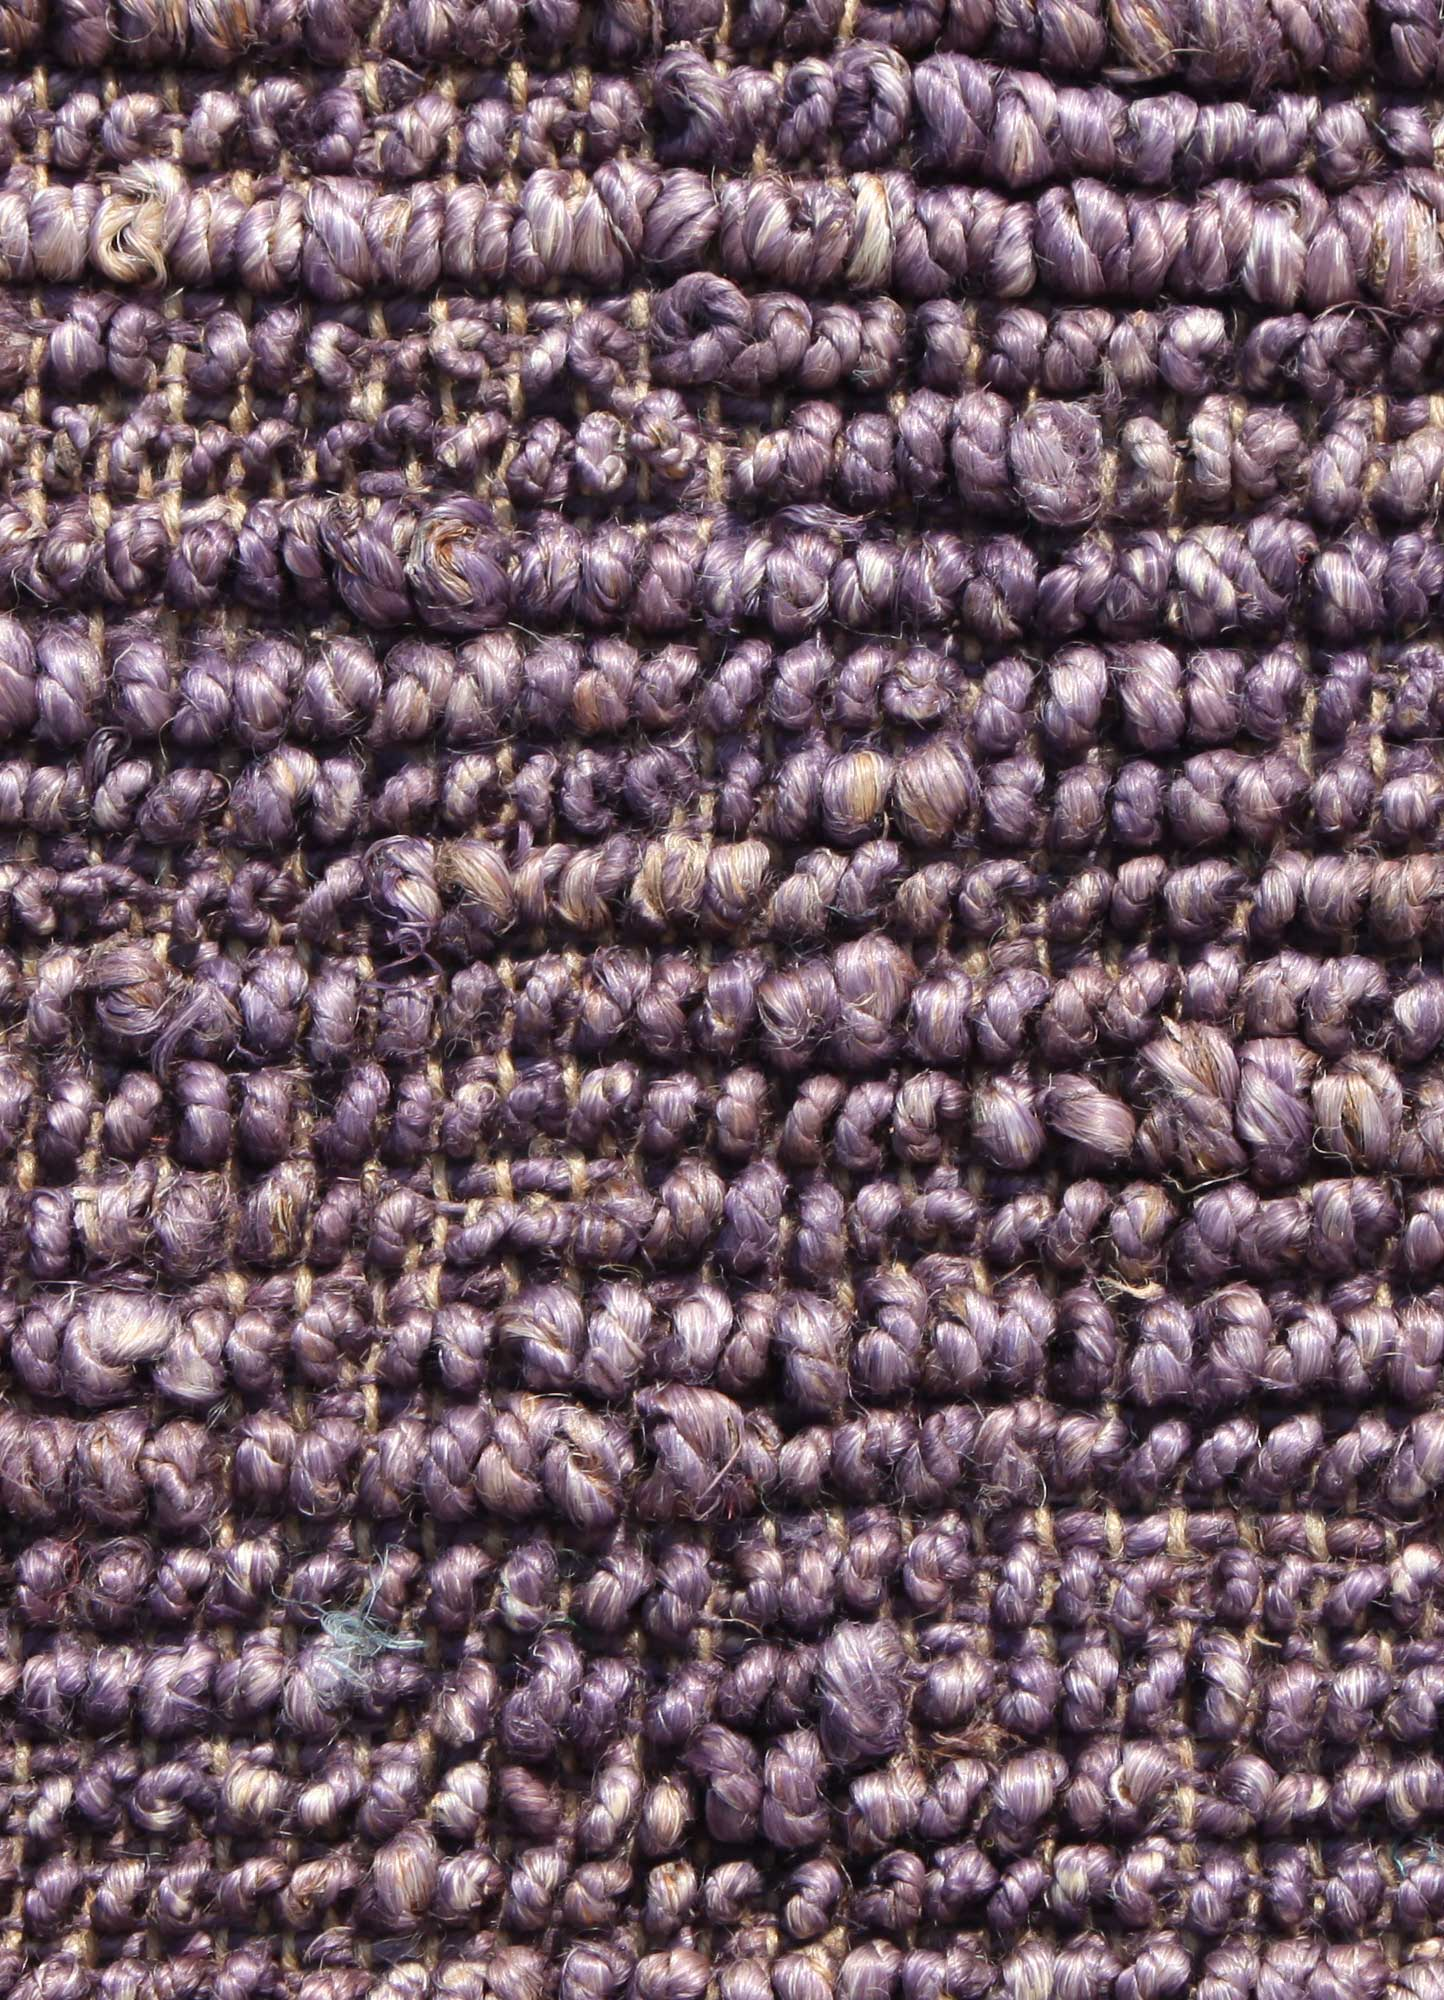 abrash pink and purple jute and hemp flat weaves Rug - CloseUp